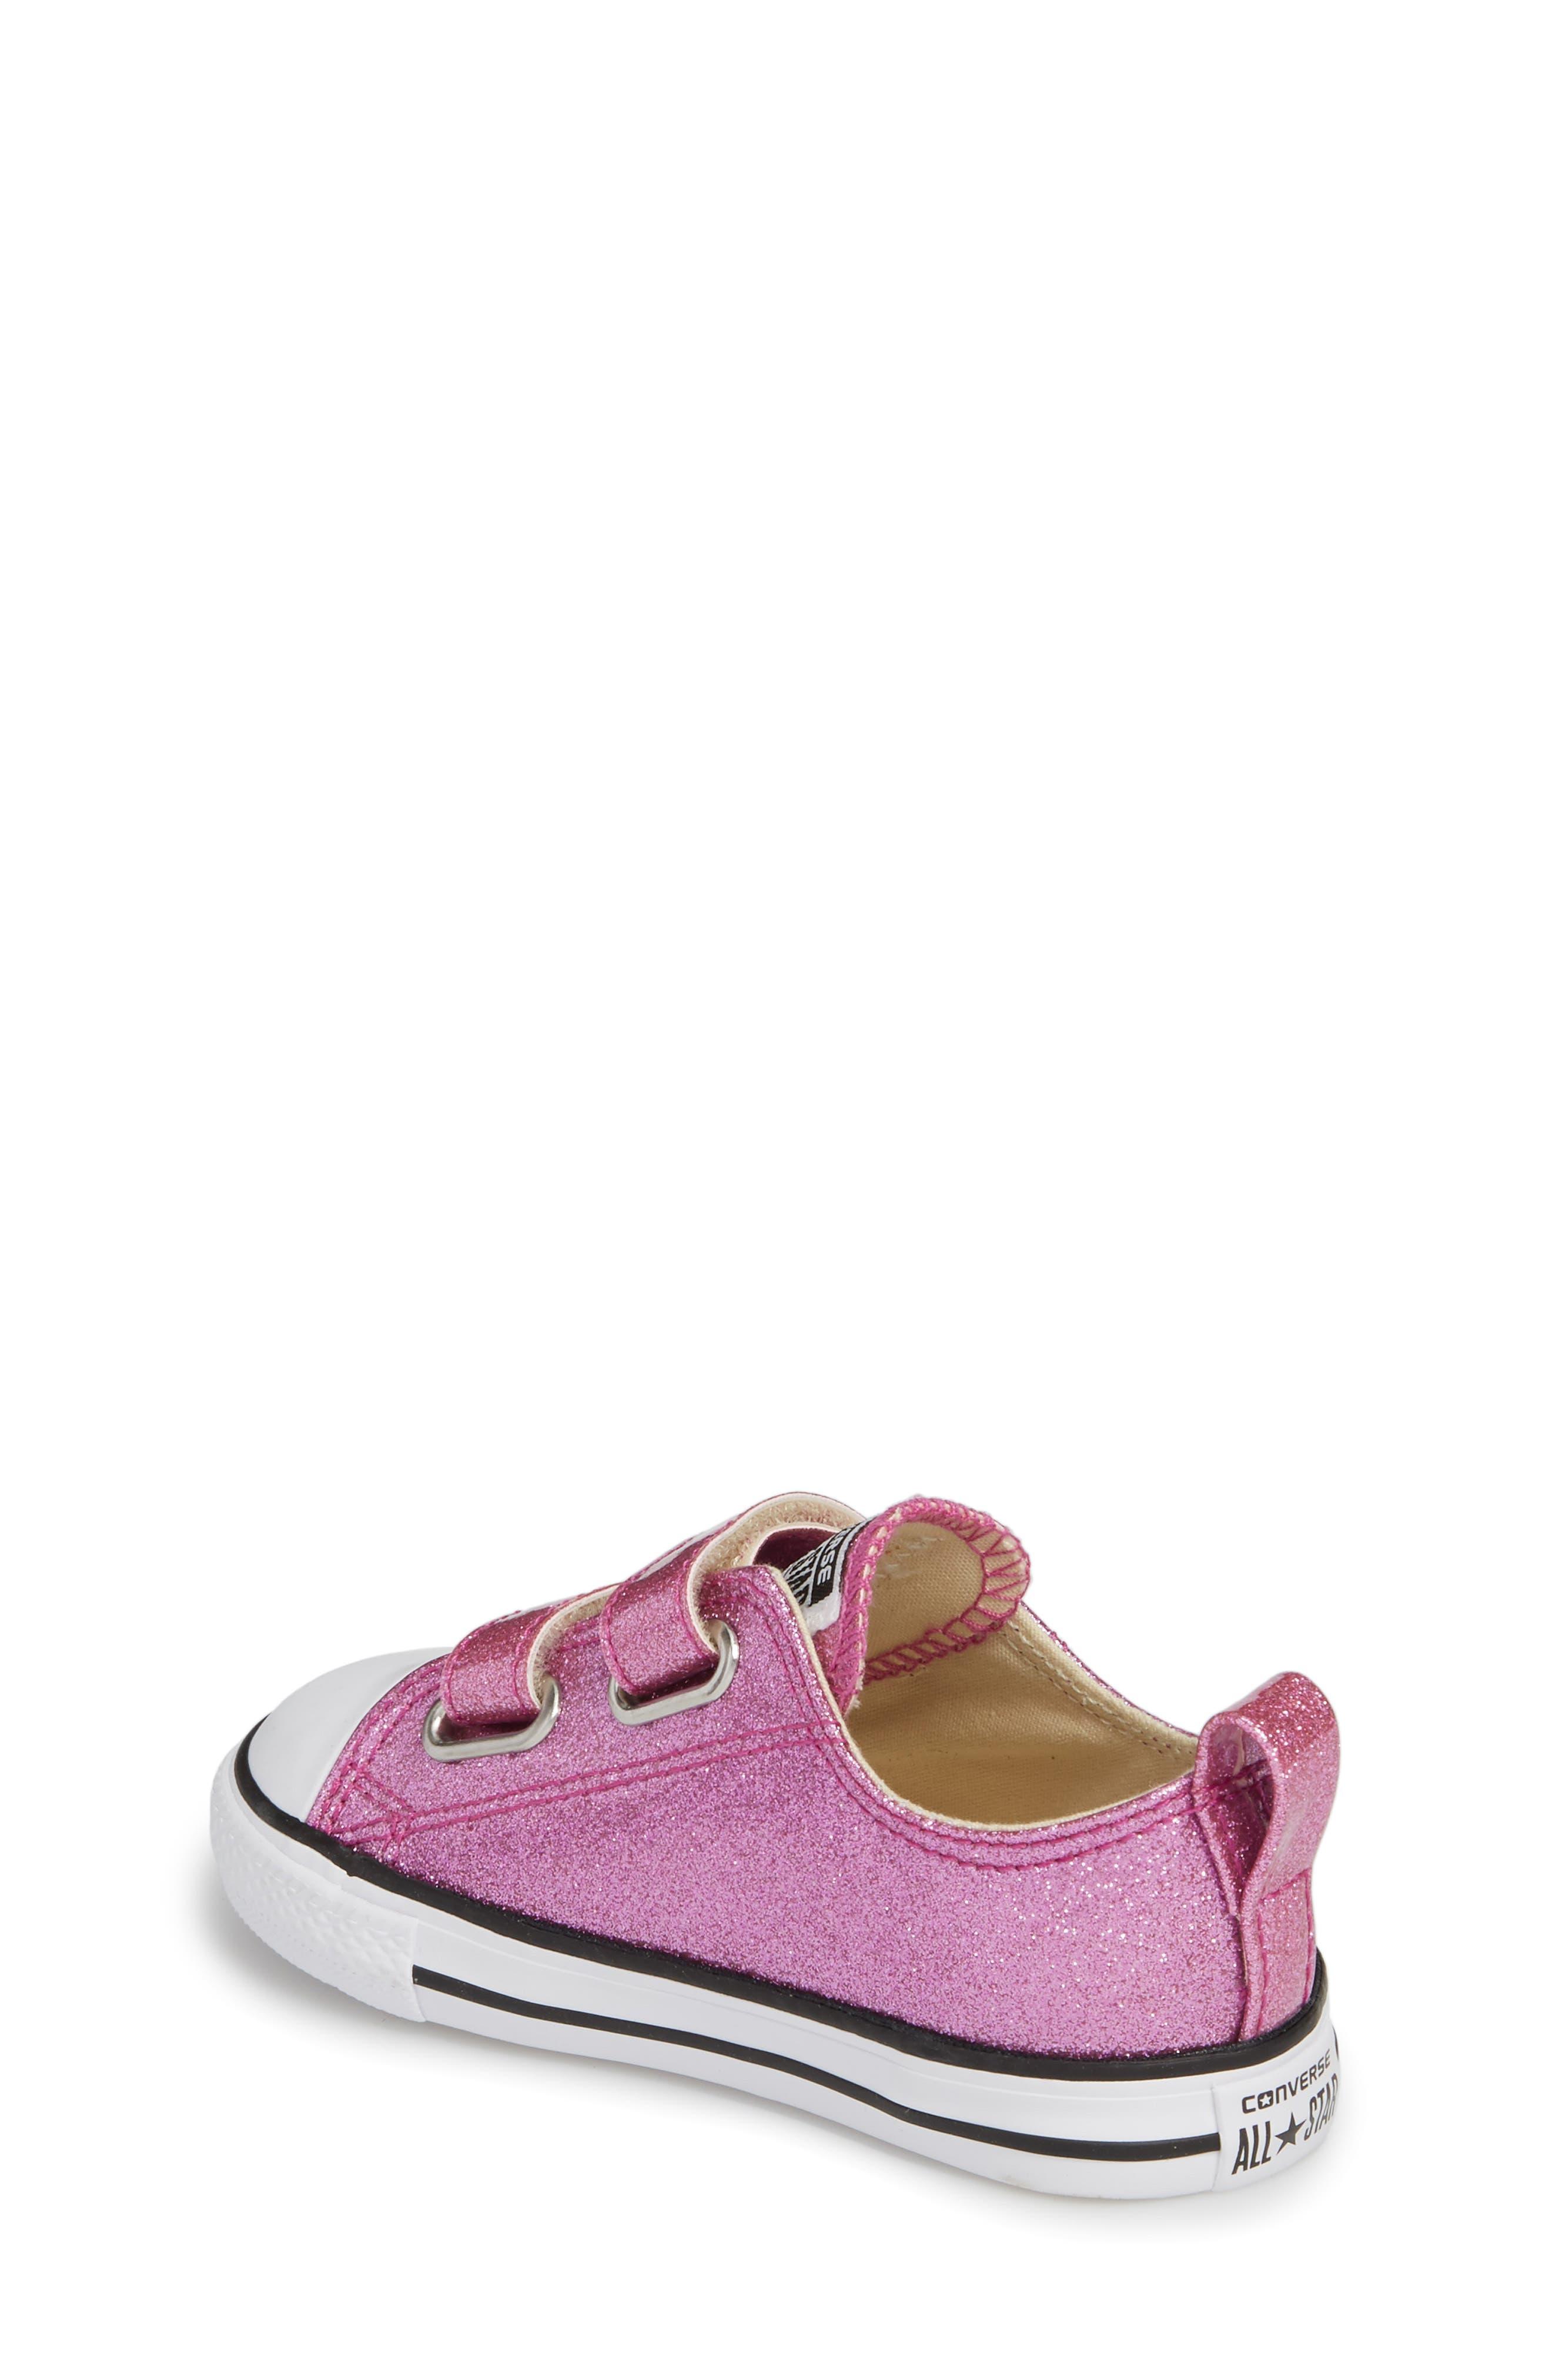 All Star<sup>®</sup> Seasonal Glitter Sneaker,                             Alternate thumbnail 2, color,                             Bright Violet